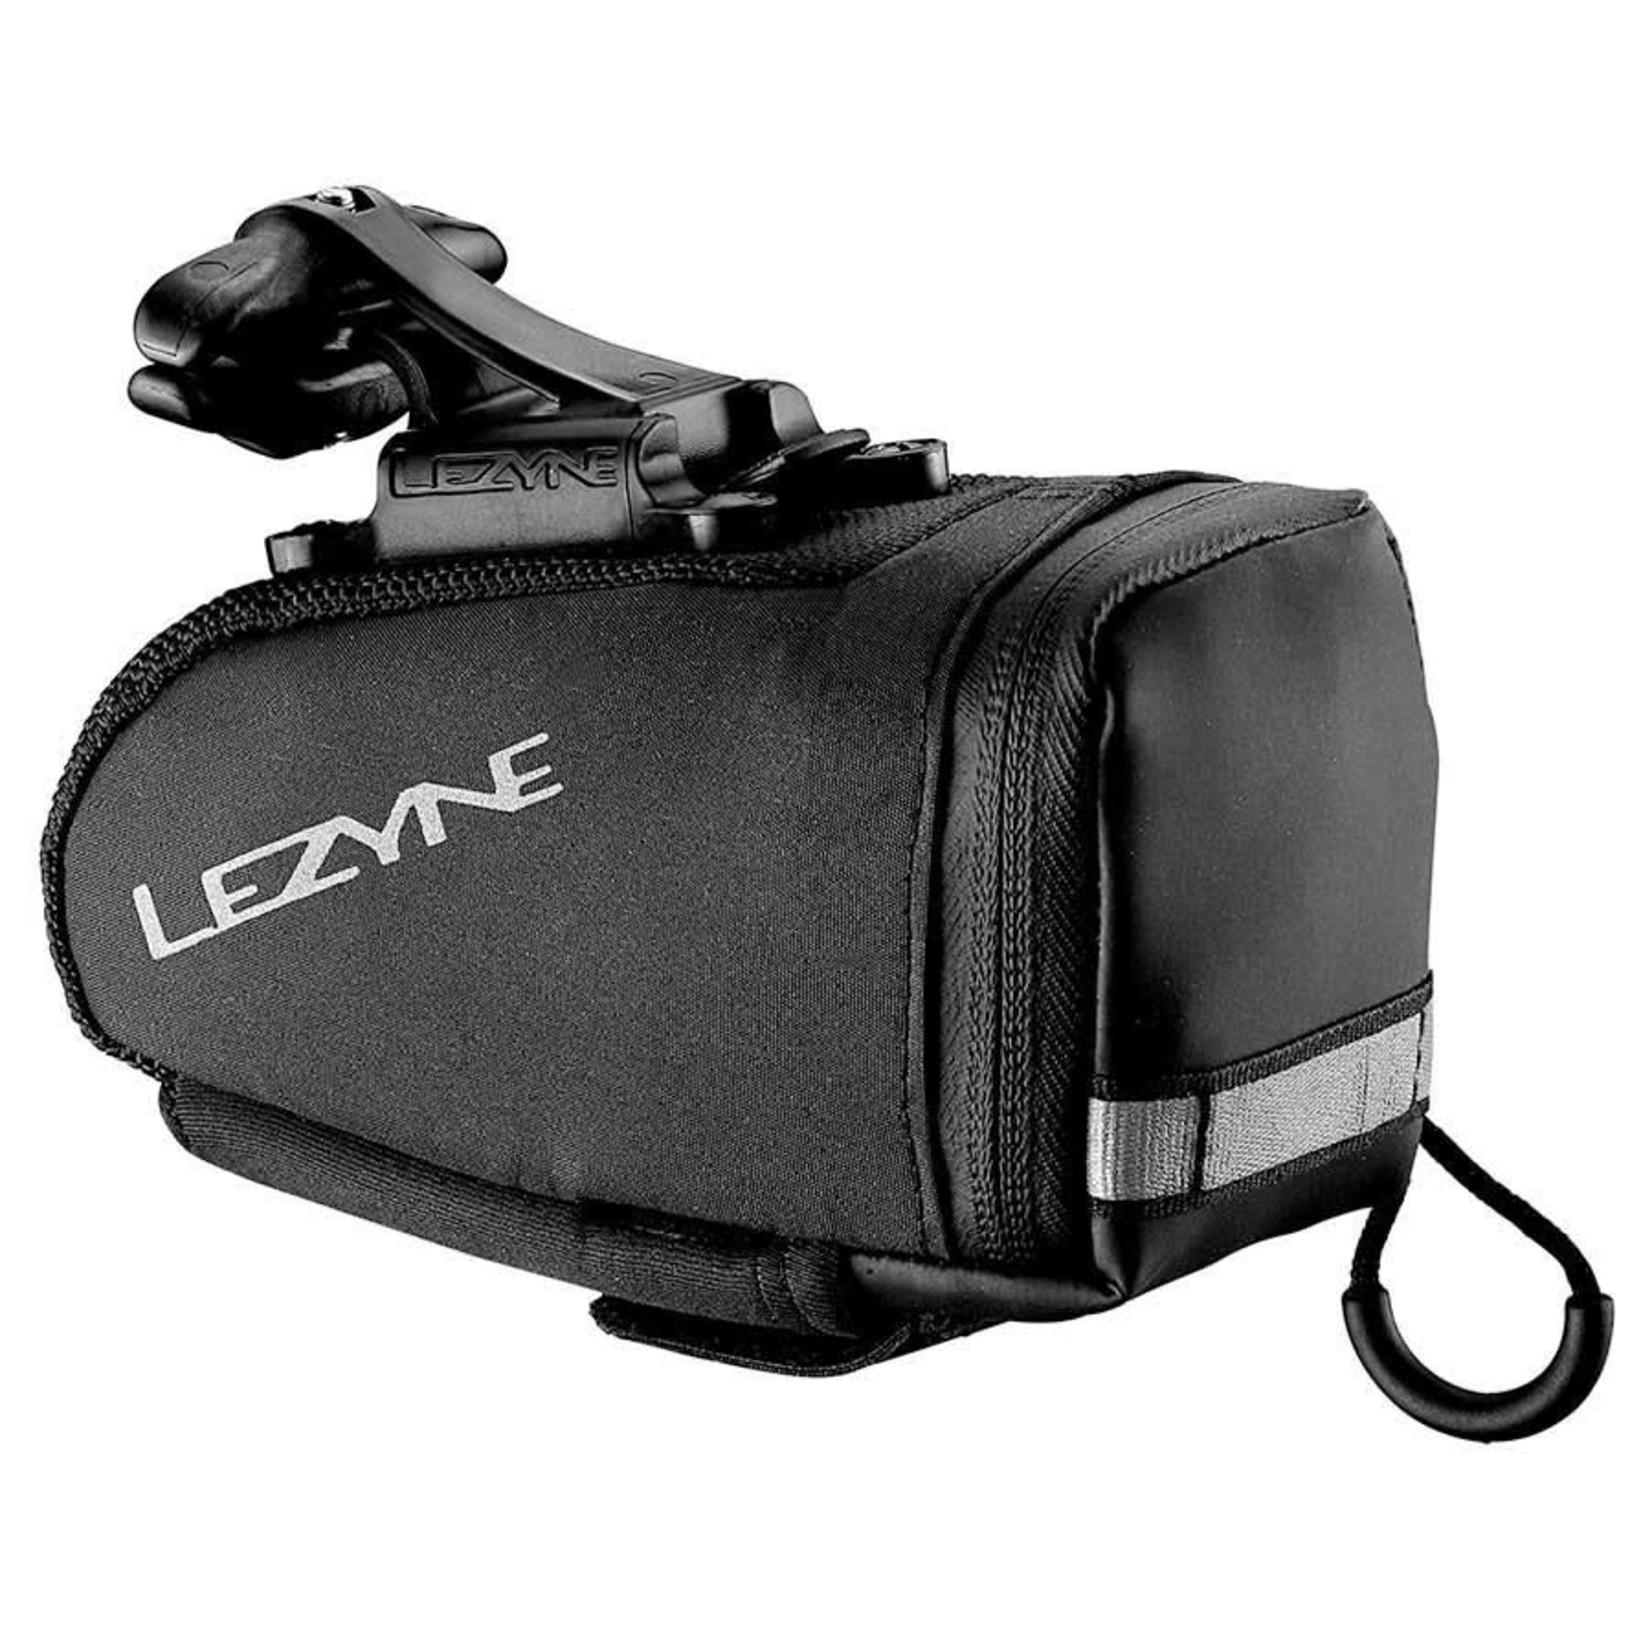 Lezyne Lezyne, M-Caddy QR, Seat Bag, 0.5L, Black